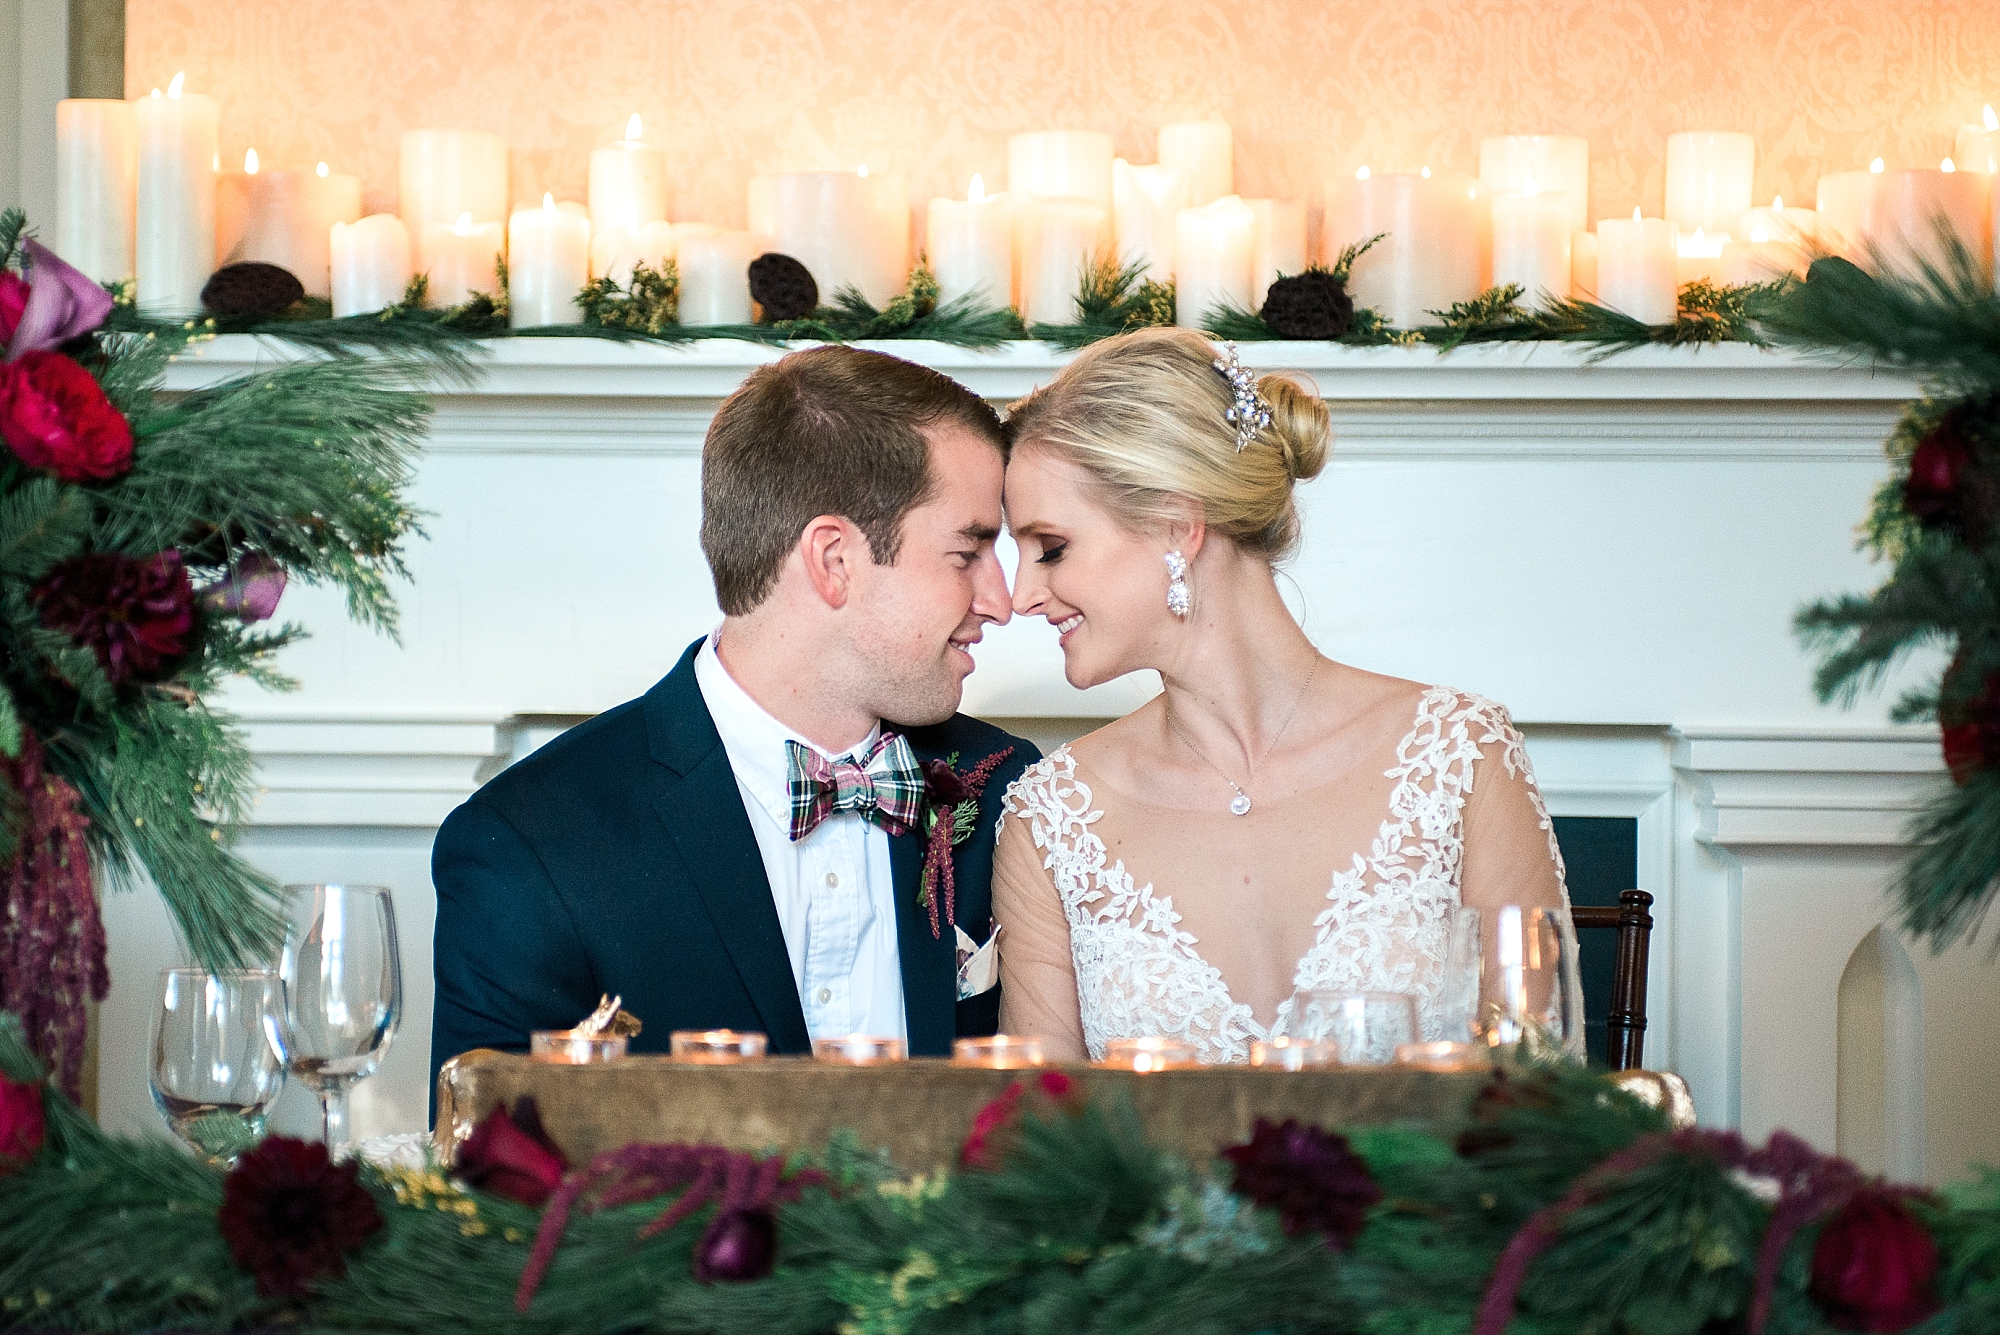 romantic-candlelit-indoor-wedding